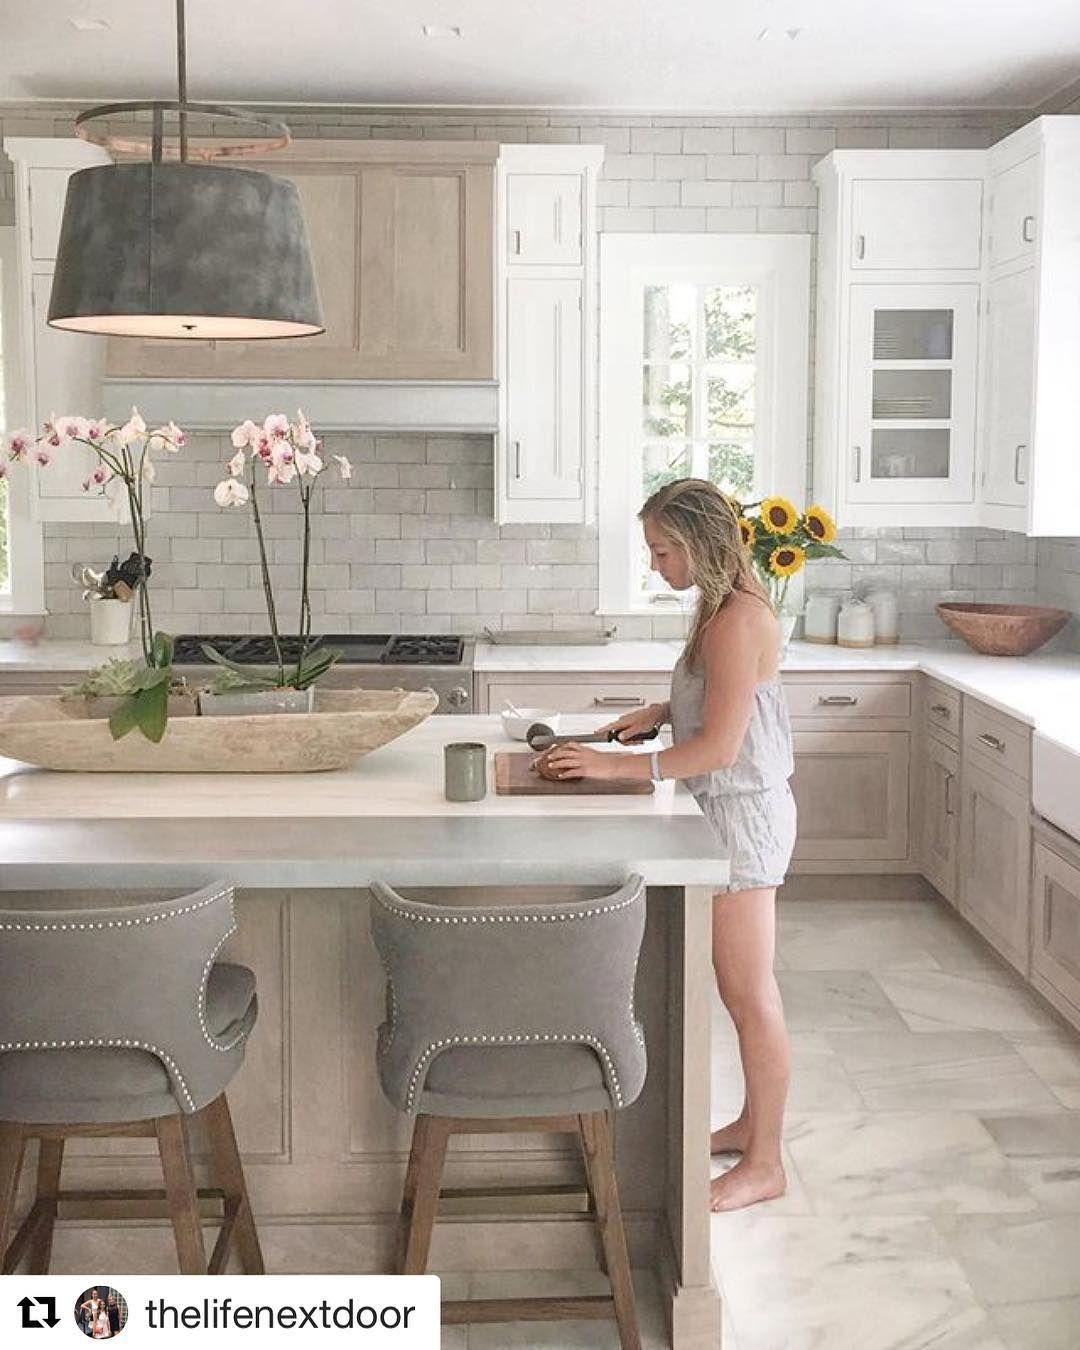 Pin De Amber Collier En Divine Kitchen Hood Inspo Decoracion De Cocina Cocinas De Casa Diseno De Cocina